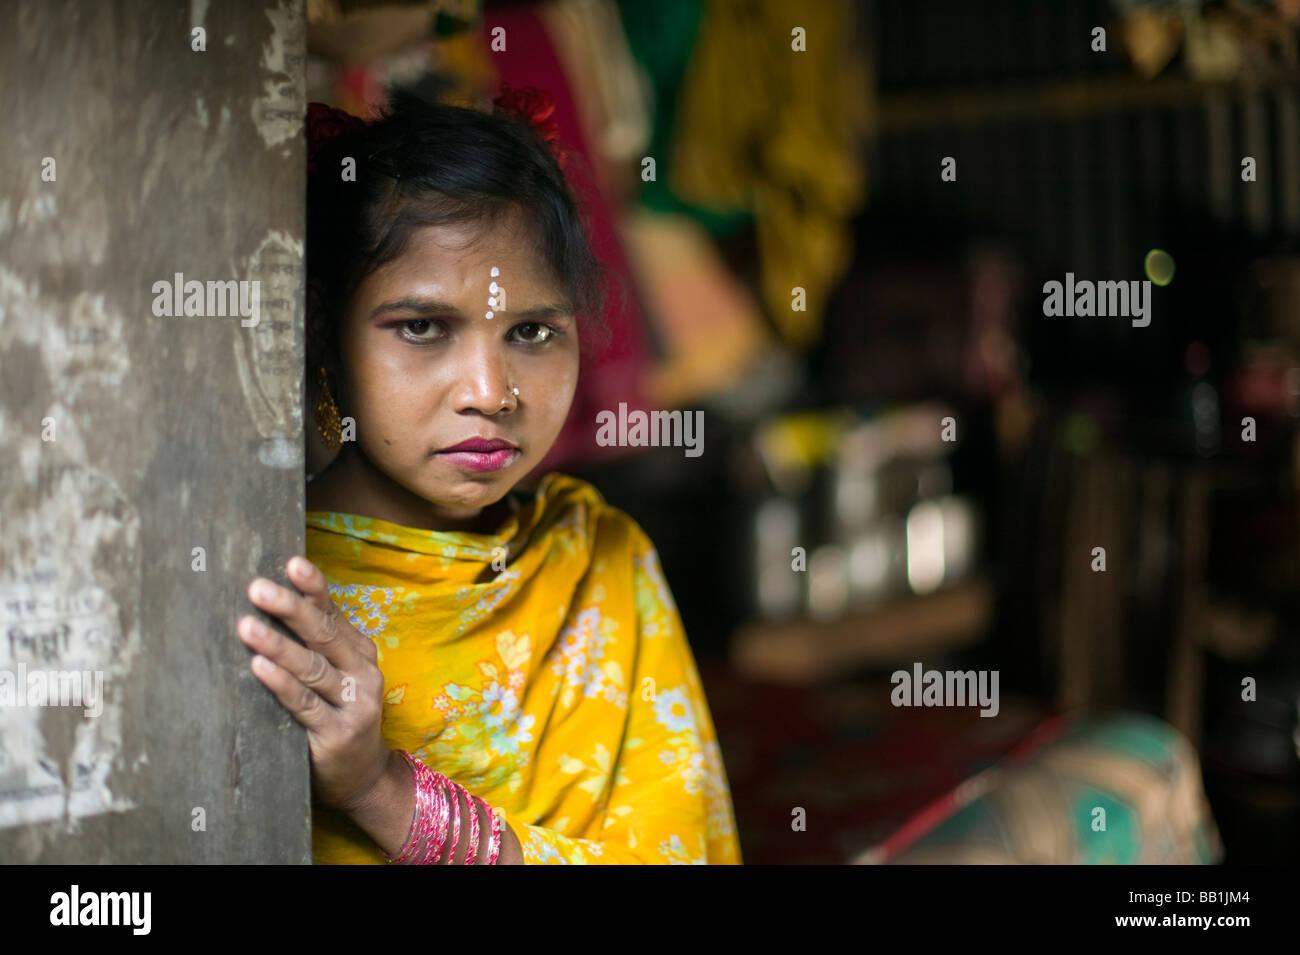 Young woman in brothel, Tangail, Bangladesh. - Stock Image